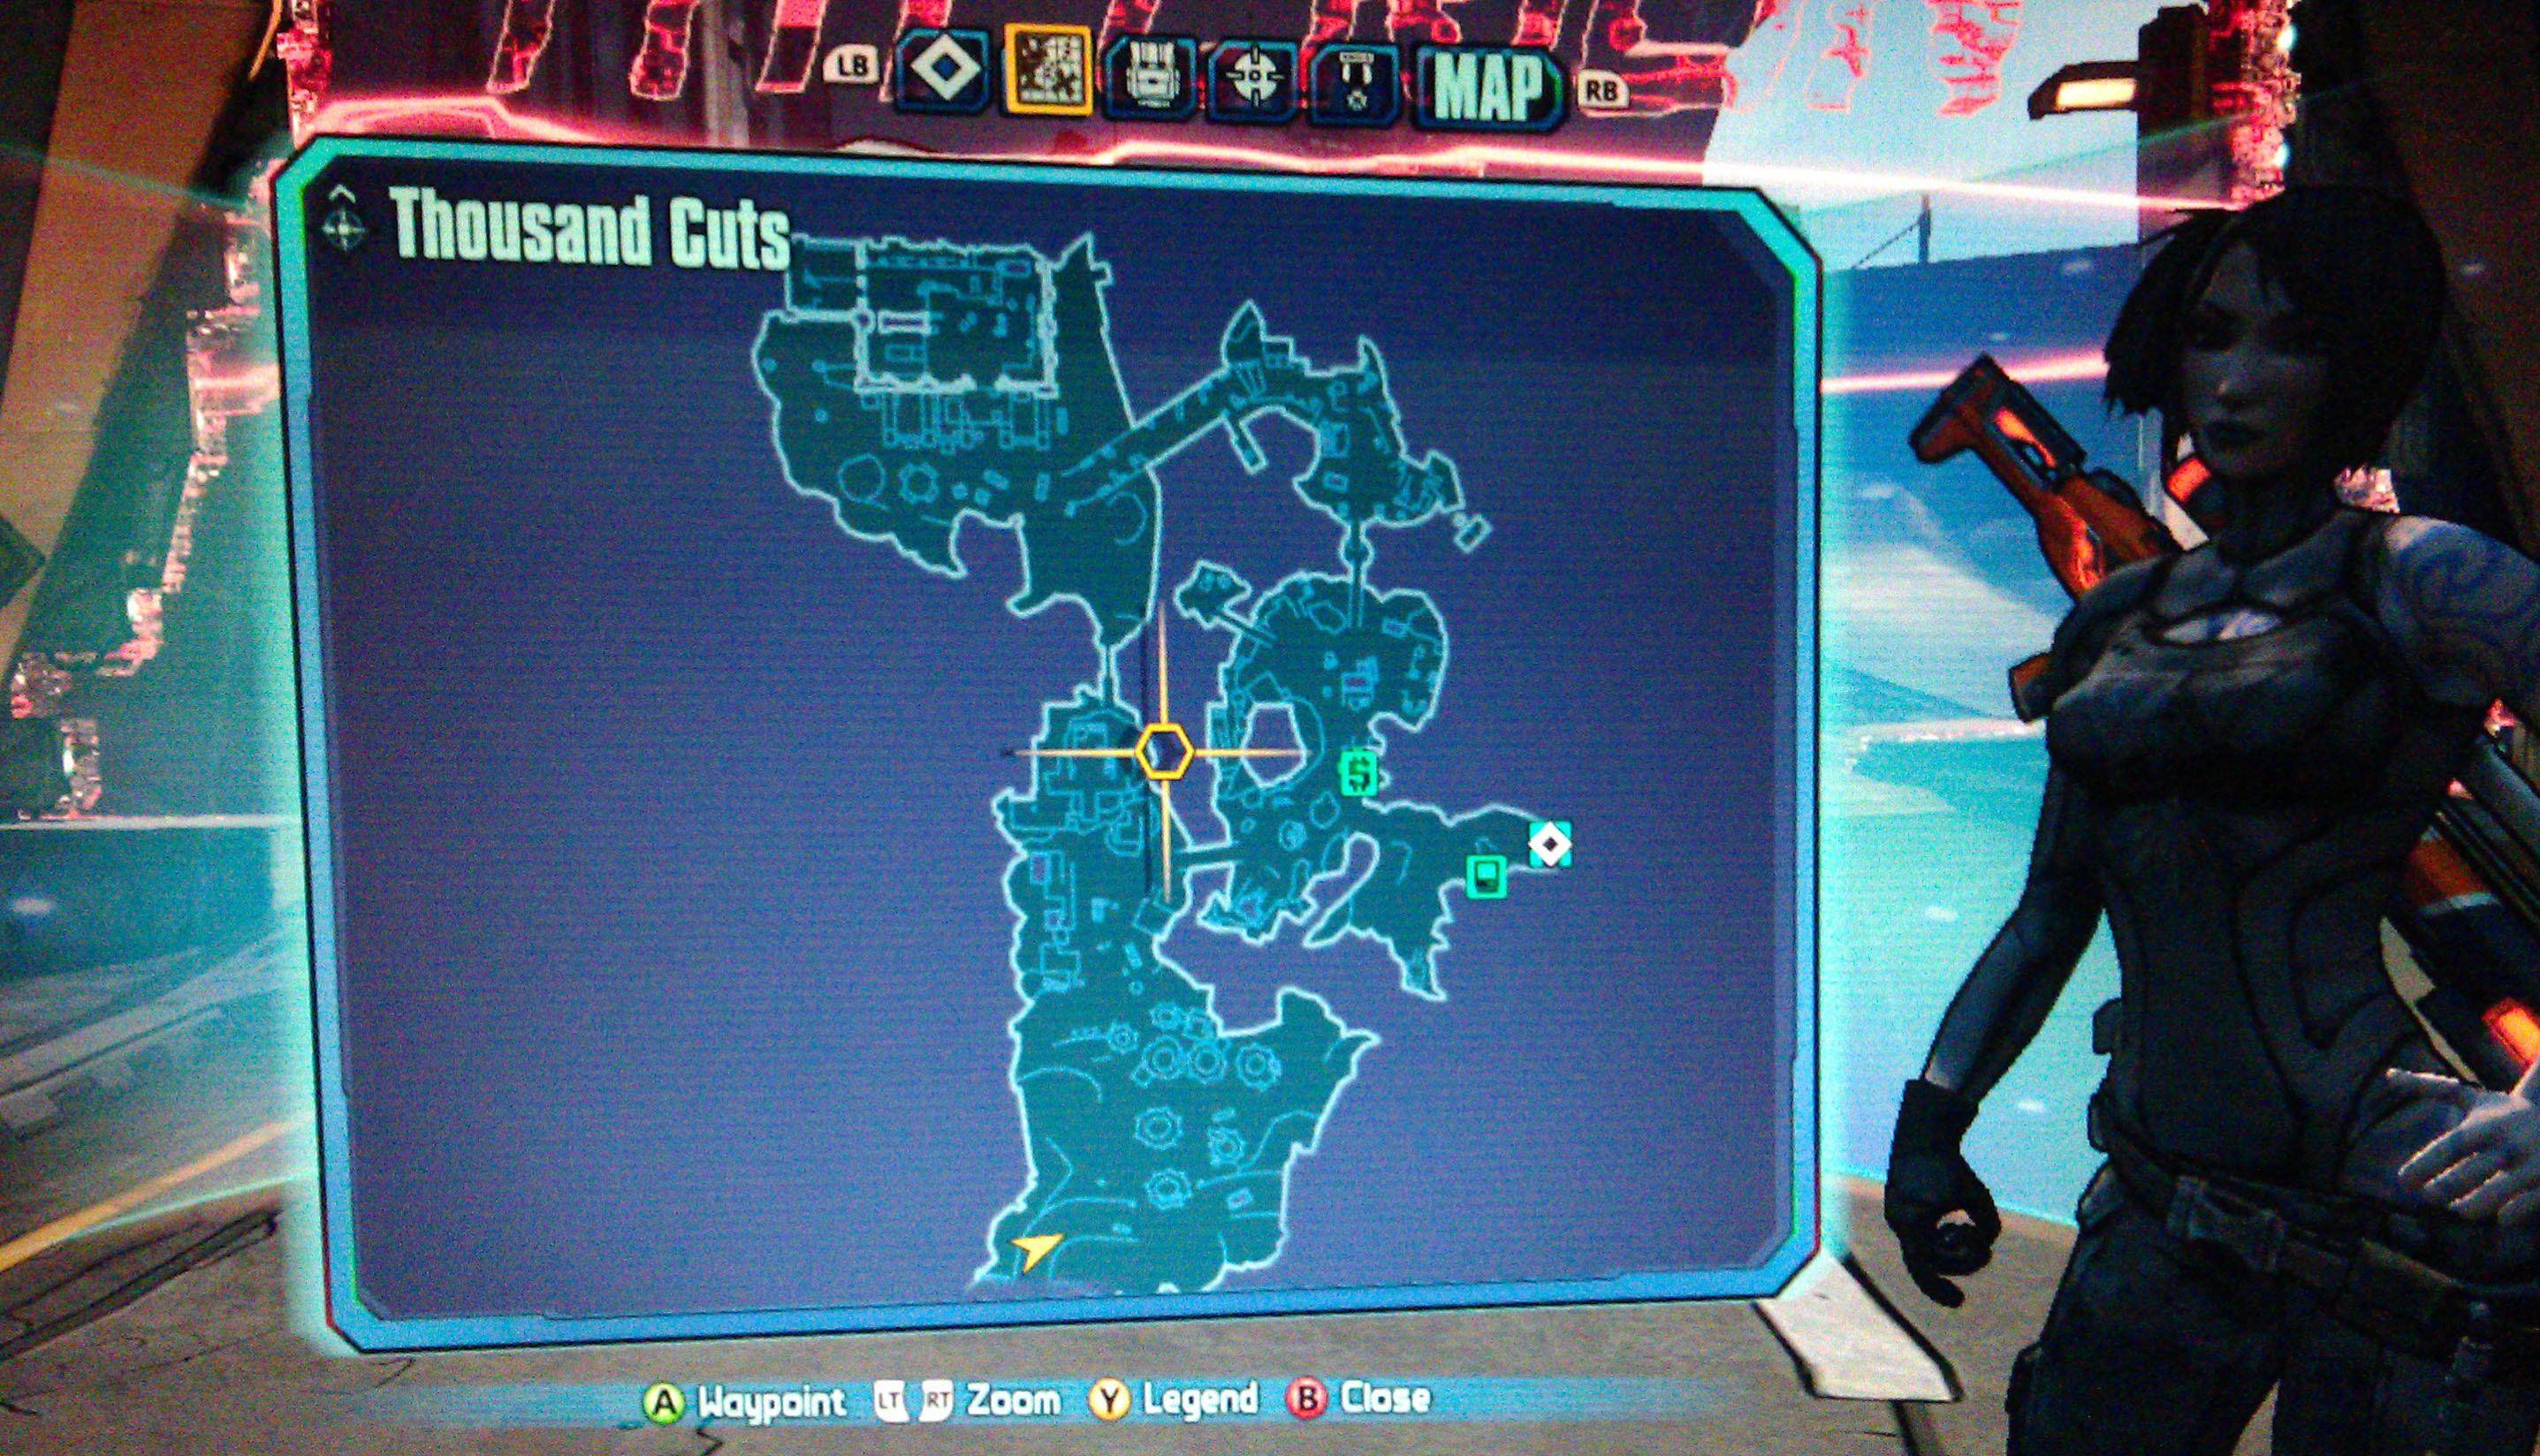 Pin On Video Games Walkthroughs